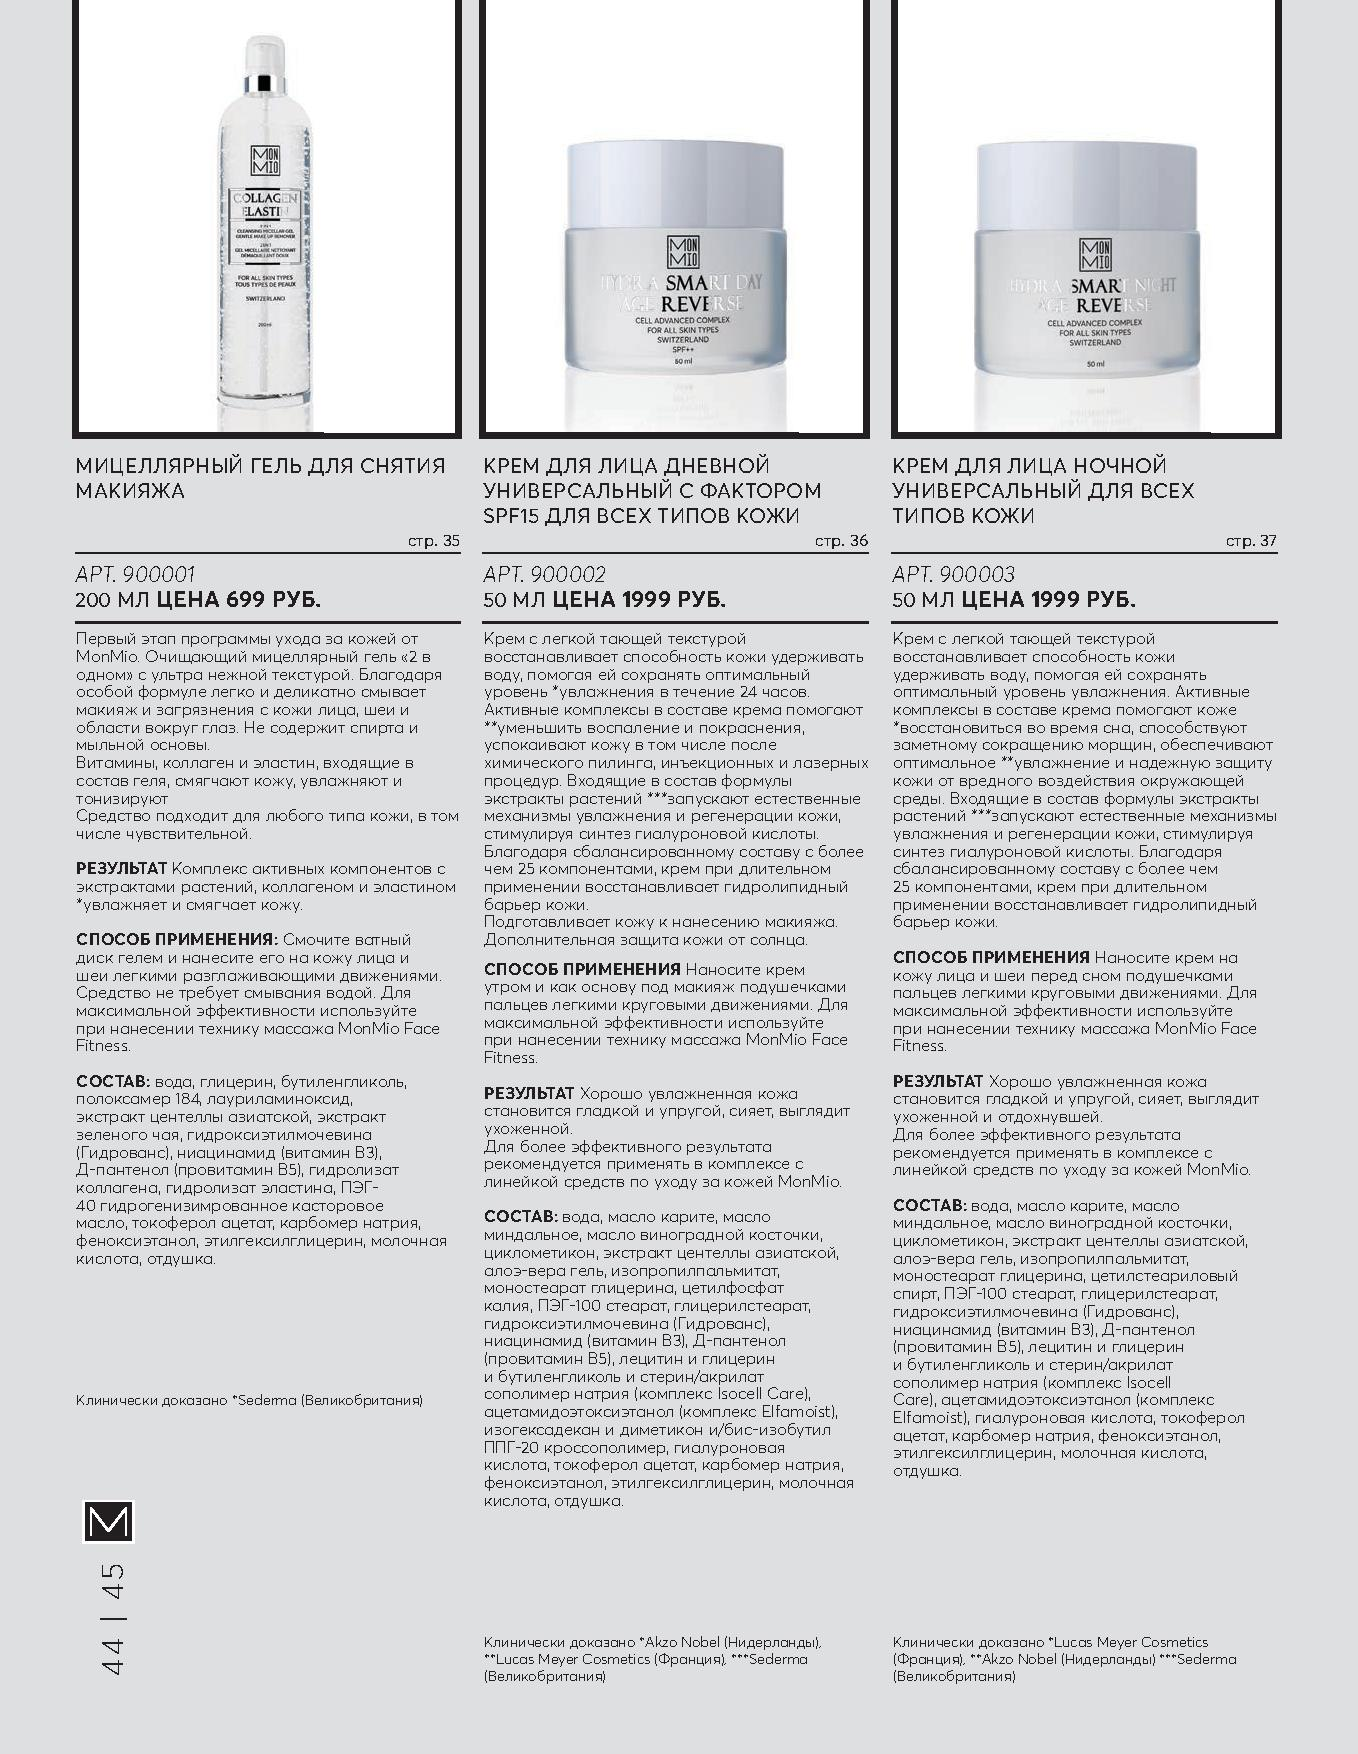 картинка описание кремов каталог МонМио осень-зима 2018-2019